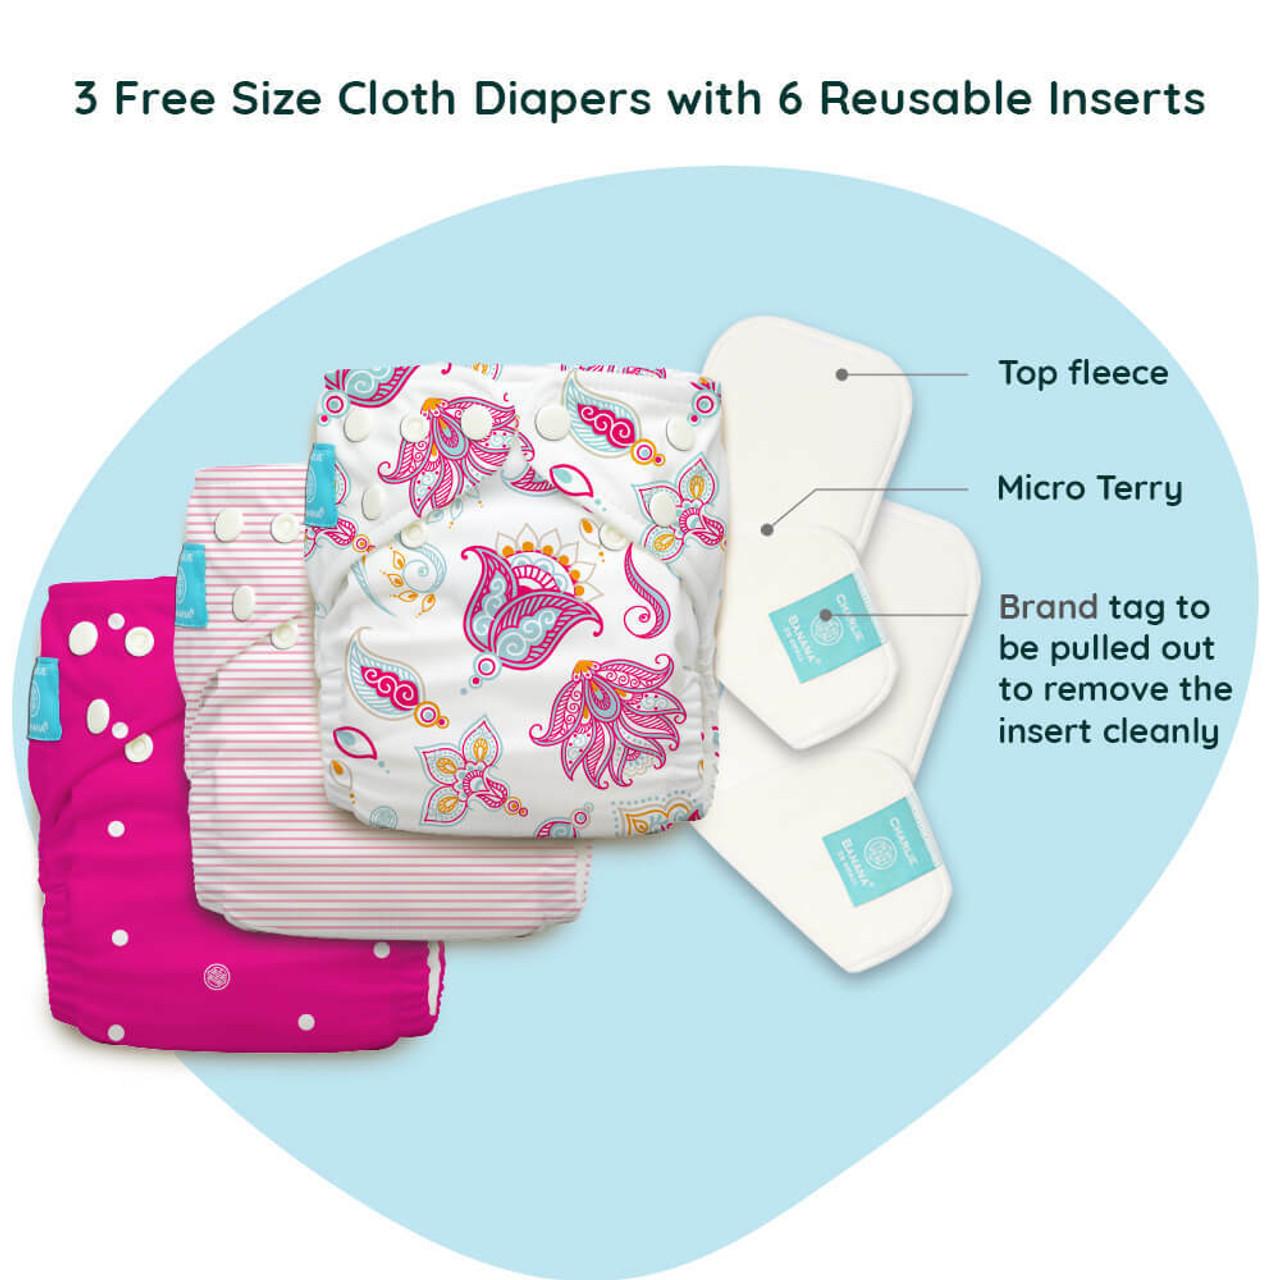 Free Size Cloth Diaper - Super Saver Pack of 3   Gratitude